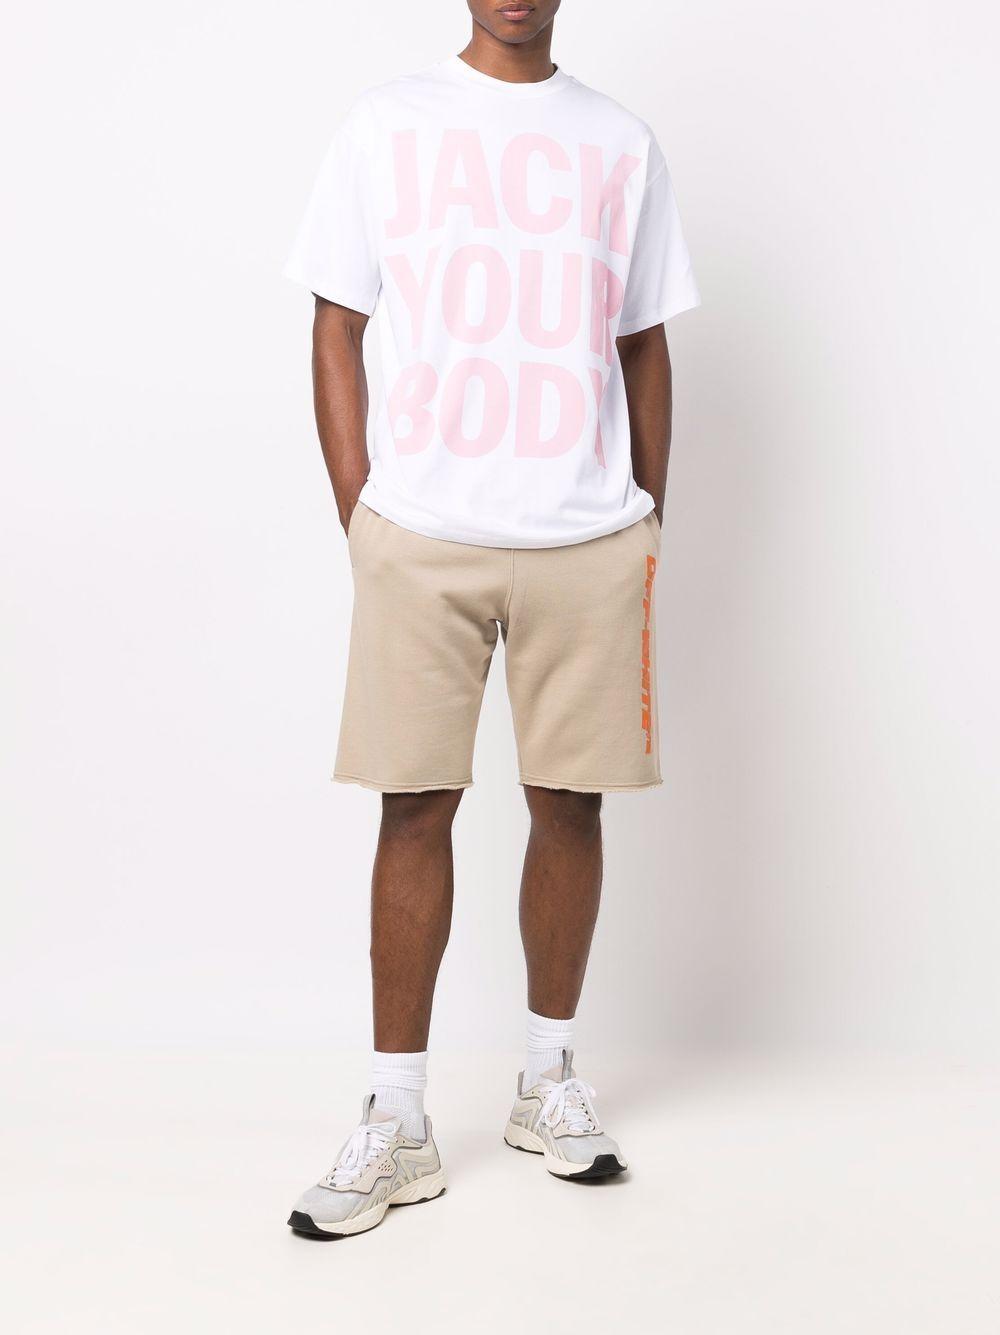 slogan t-shirt man white in cotton HONEY FUCKING DIJON | T-shirts | HFD04T0025